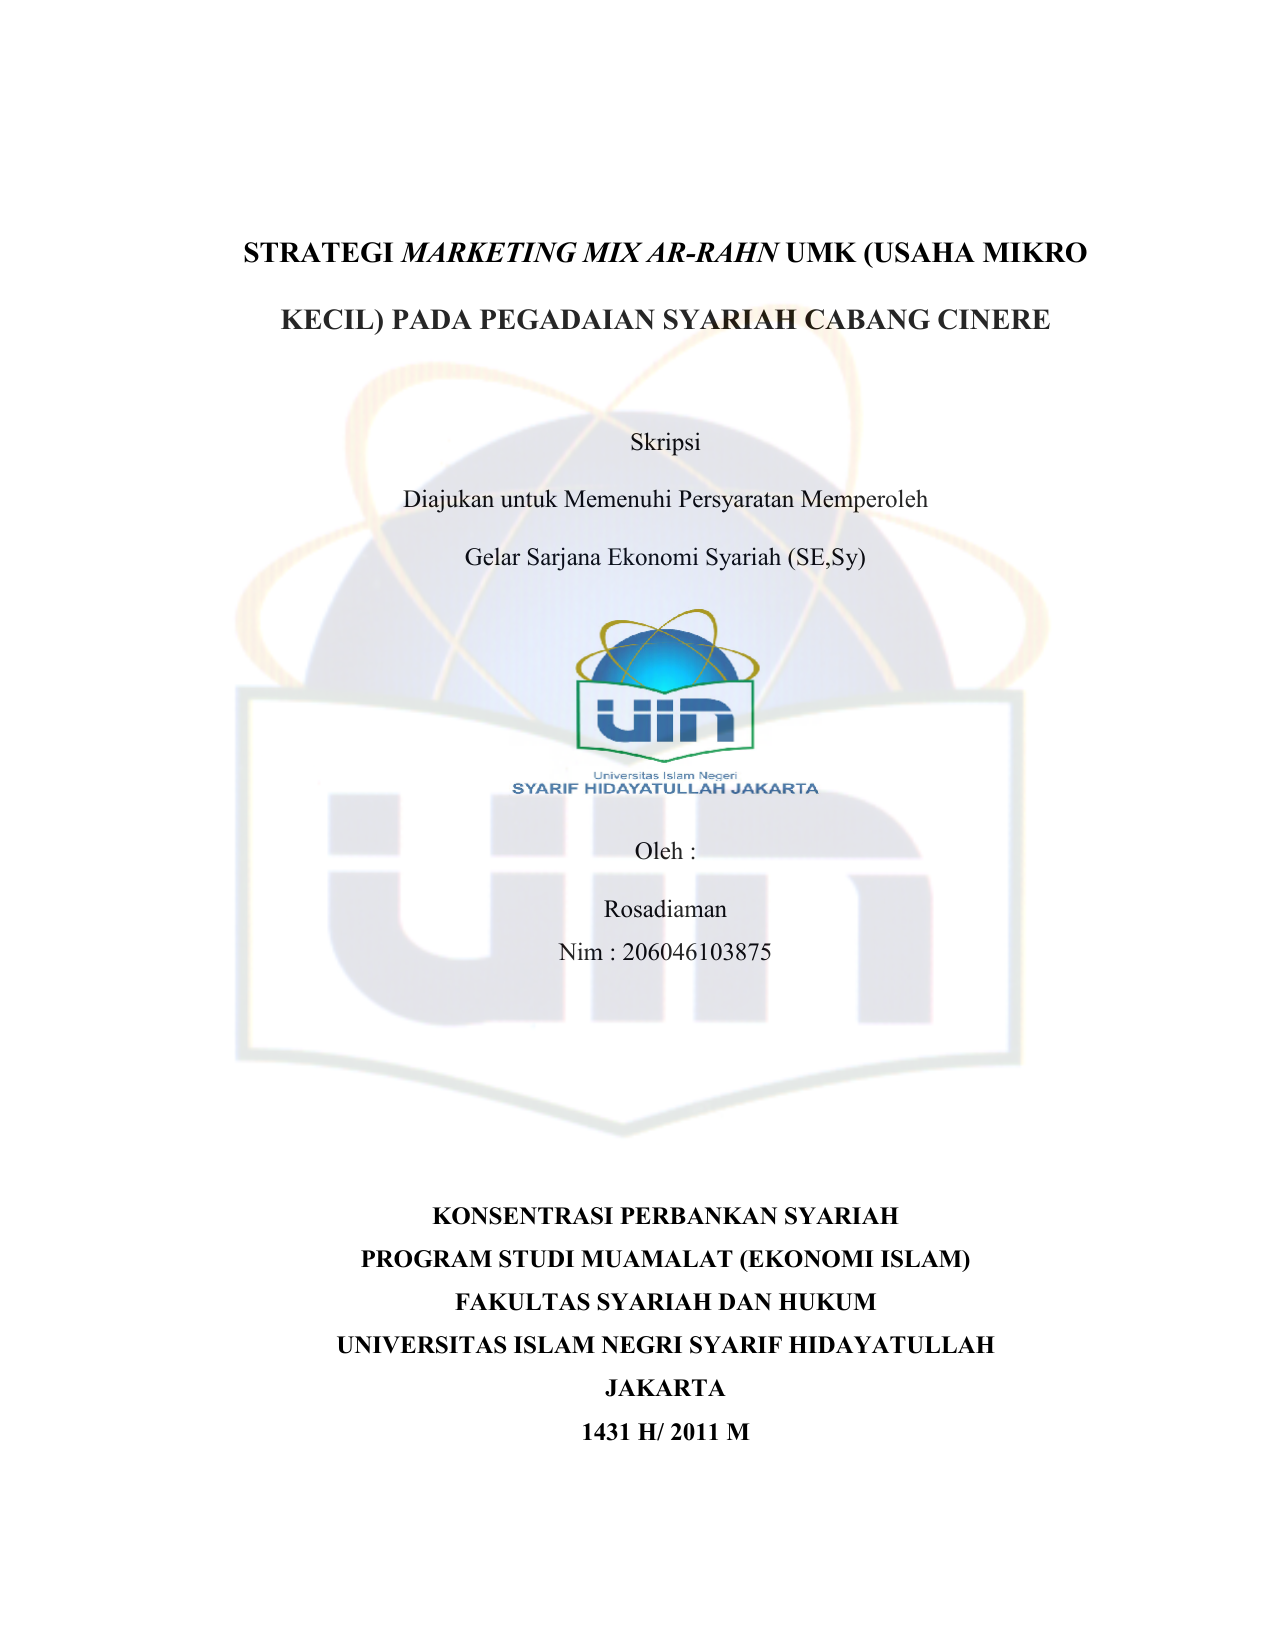 Strategi Marketing Mix Ar Rahn Umk Usaha Mikro